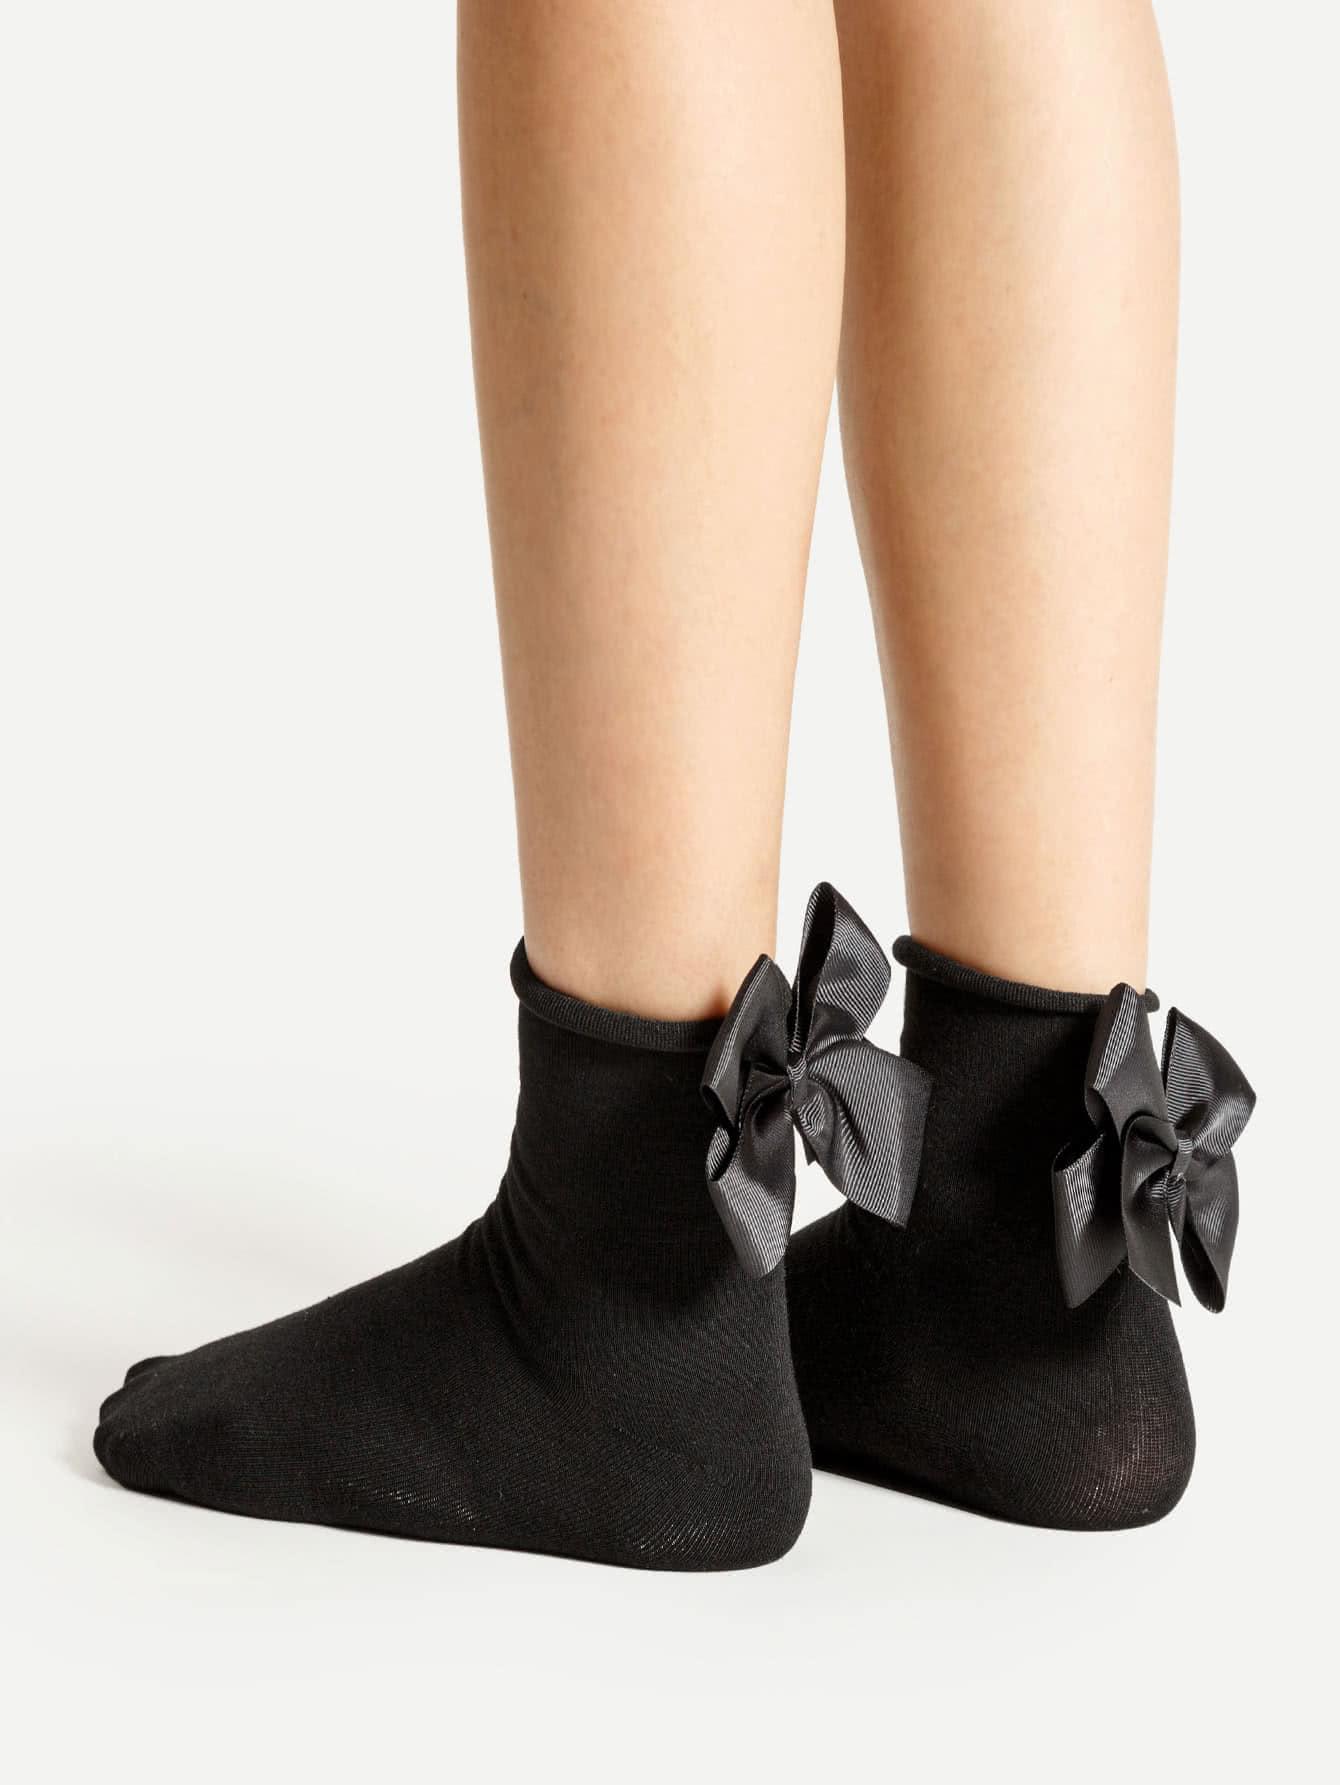 Bow Tie Back Ankle Socks